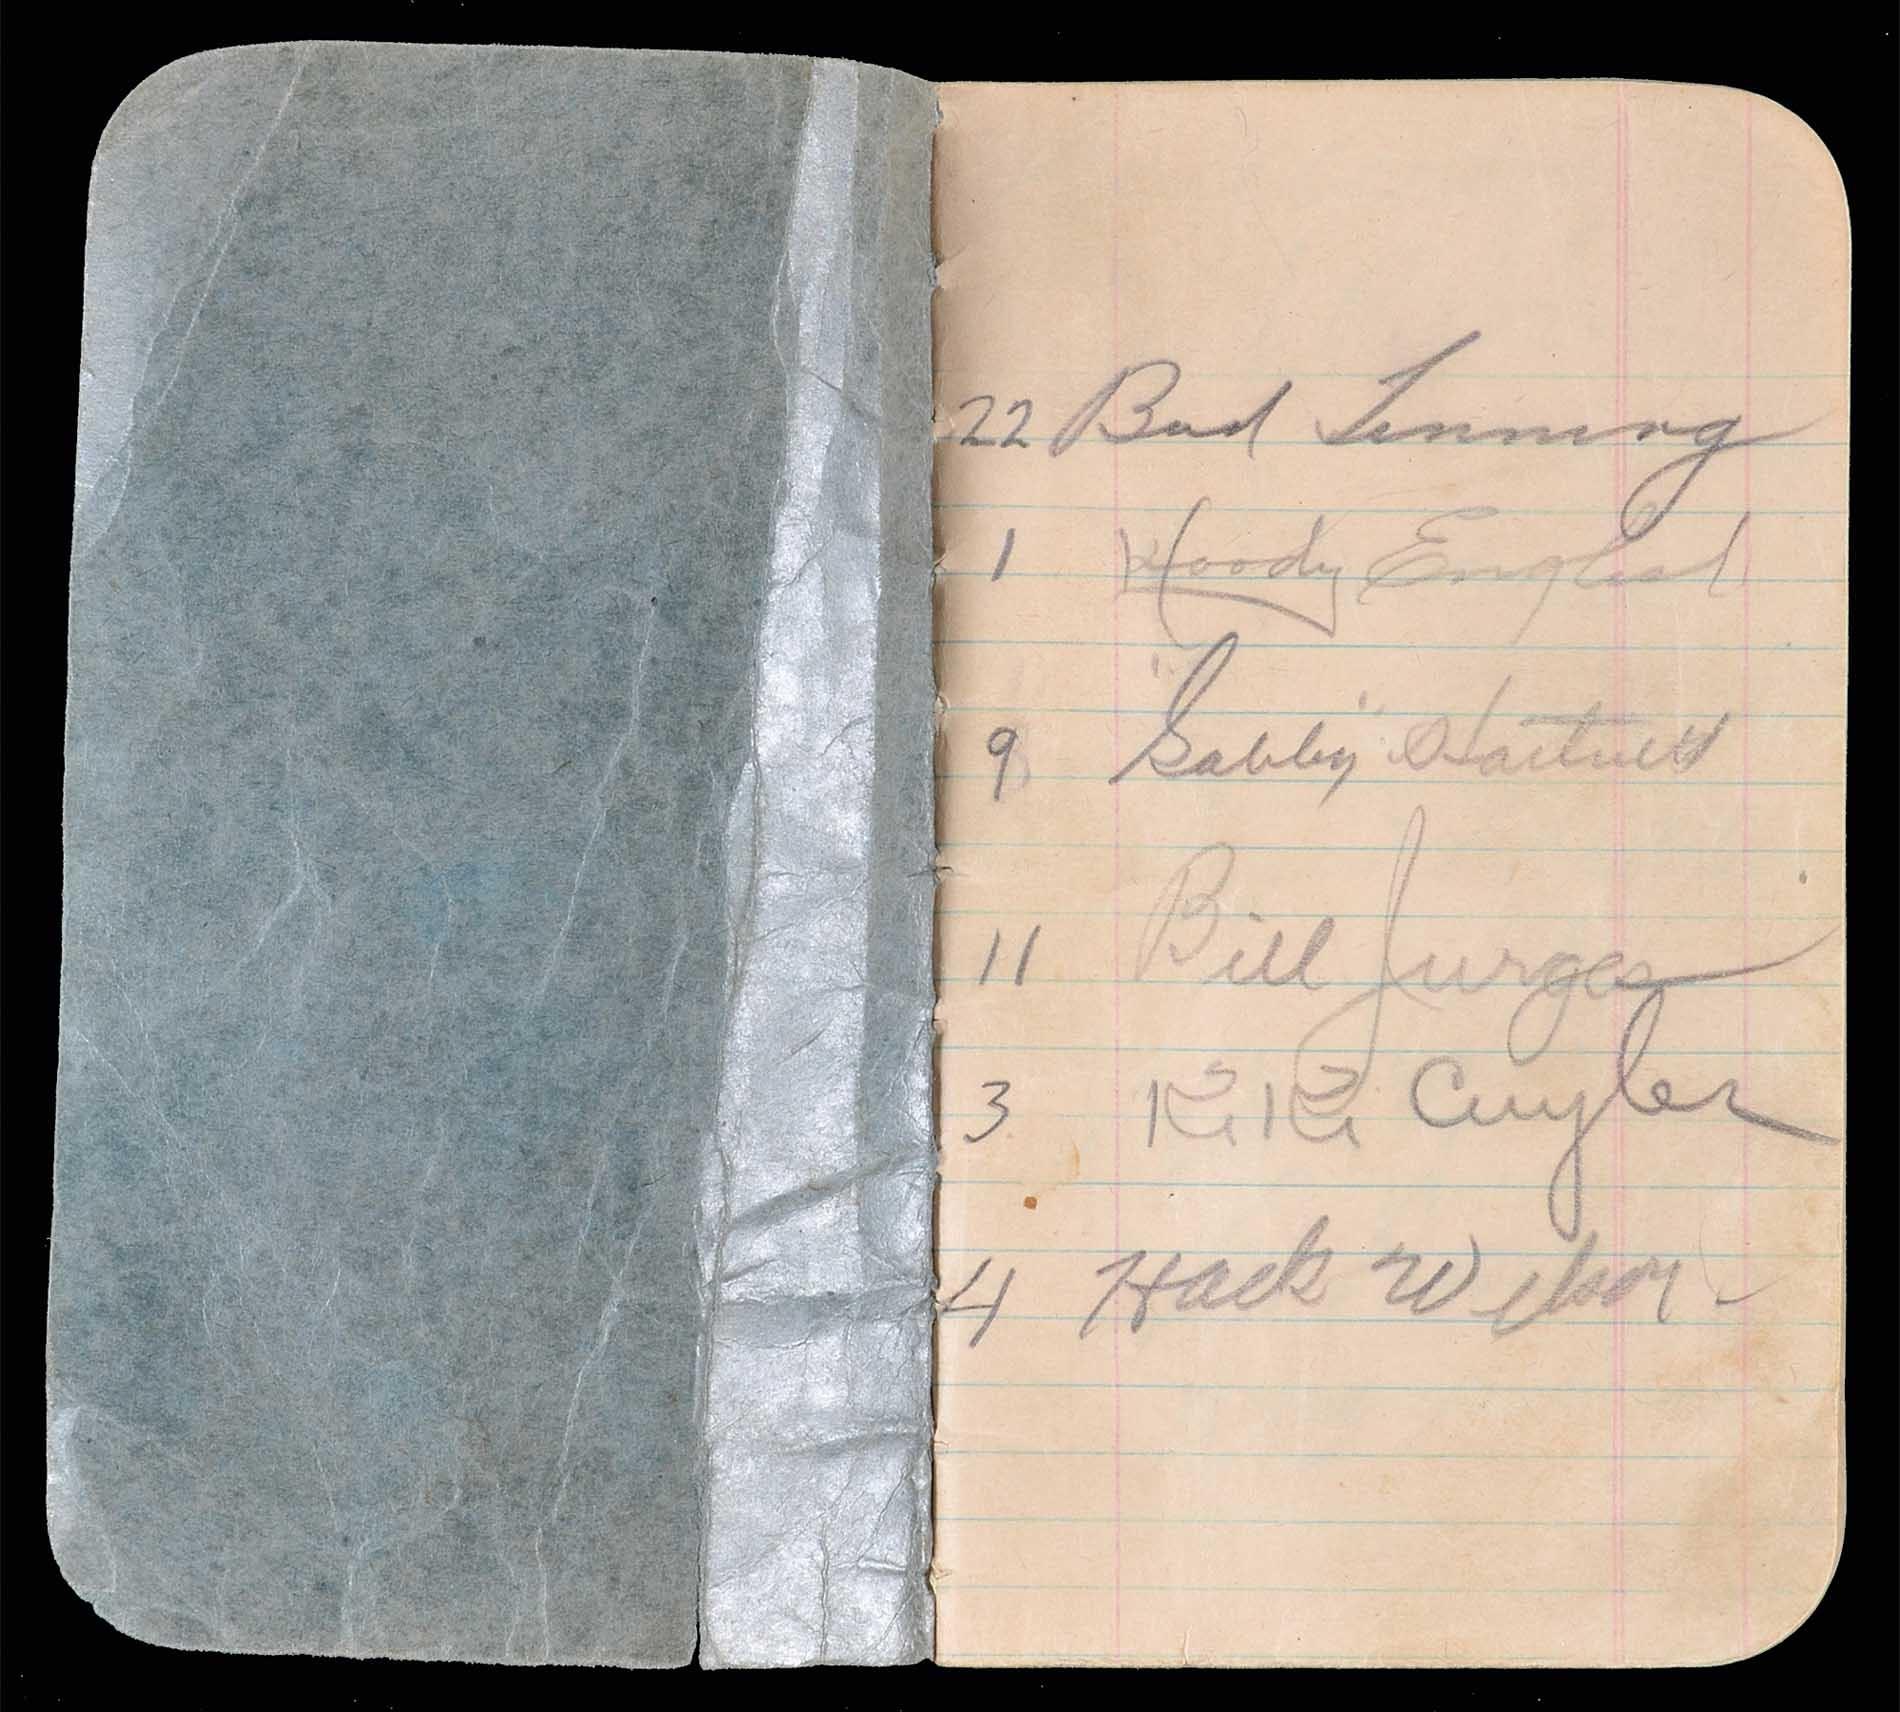 Lot # 1514: 1934 Autograph Book Featuring 17 Signatures